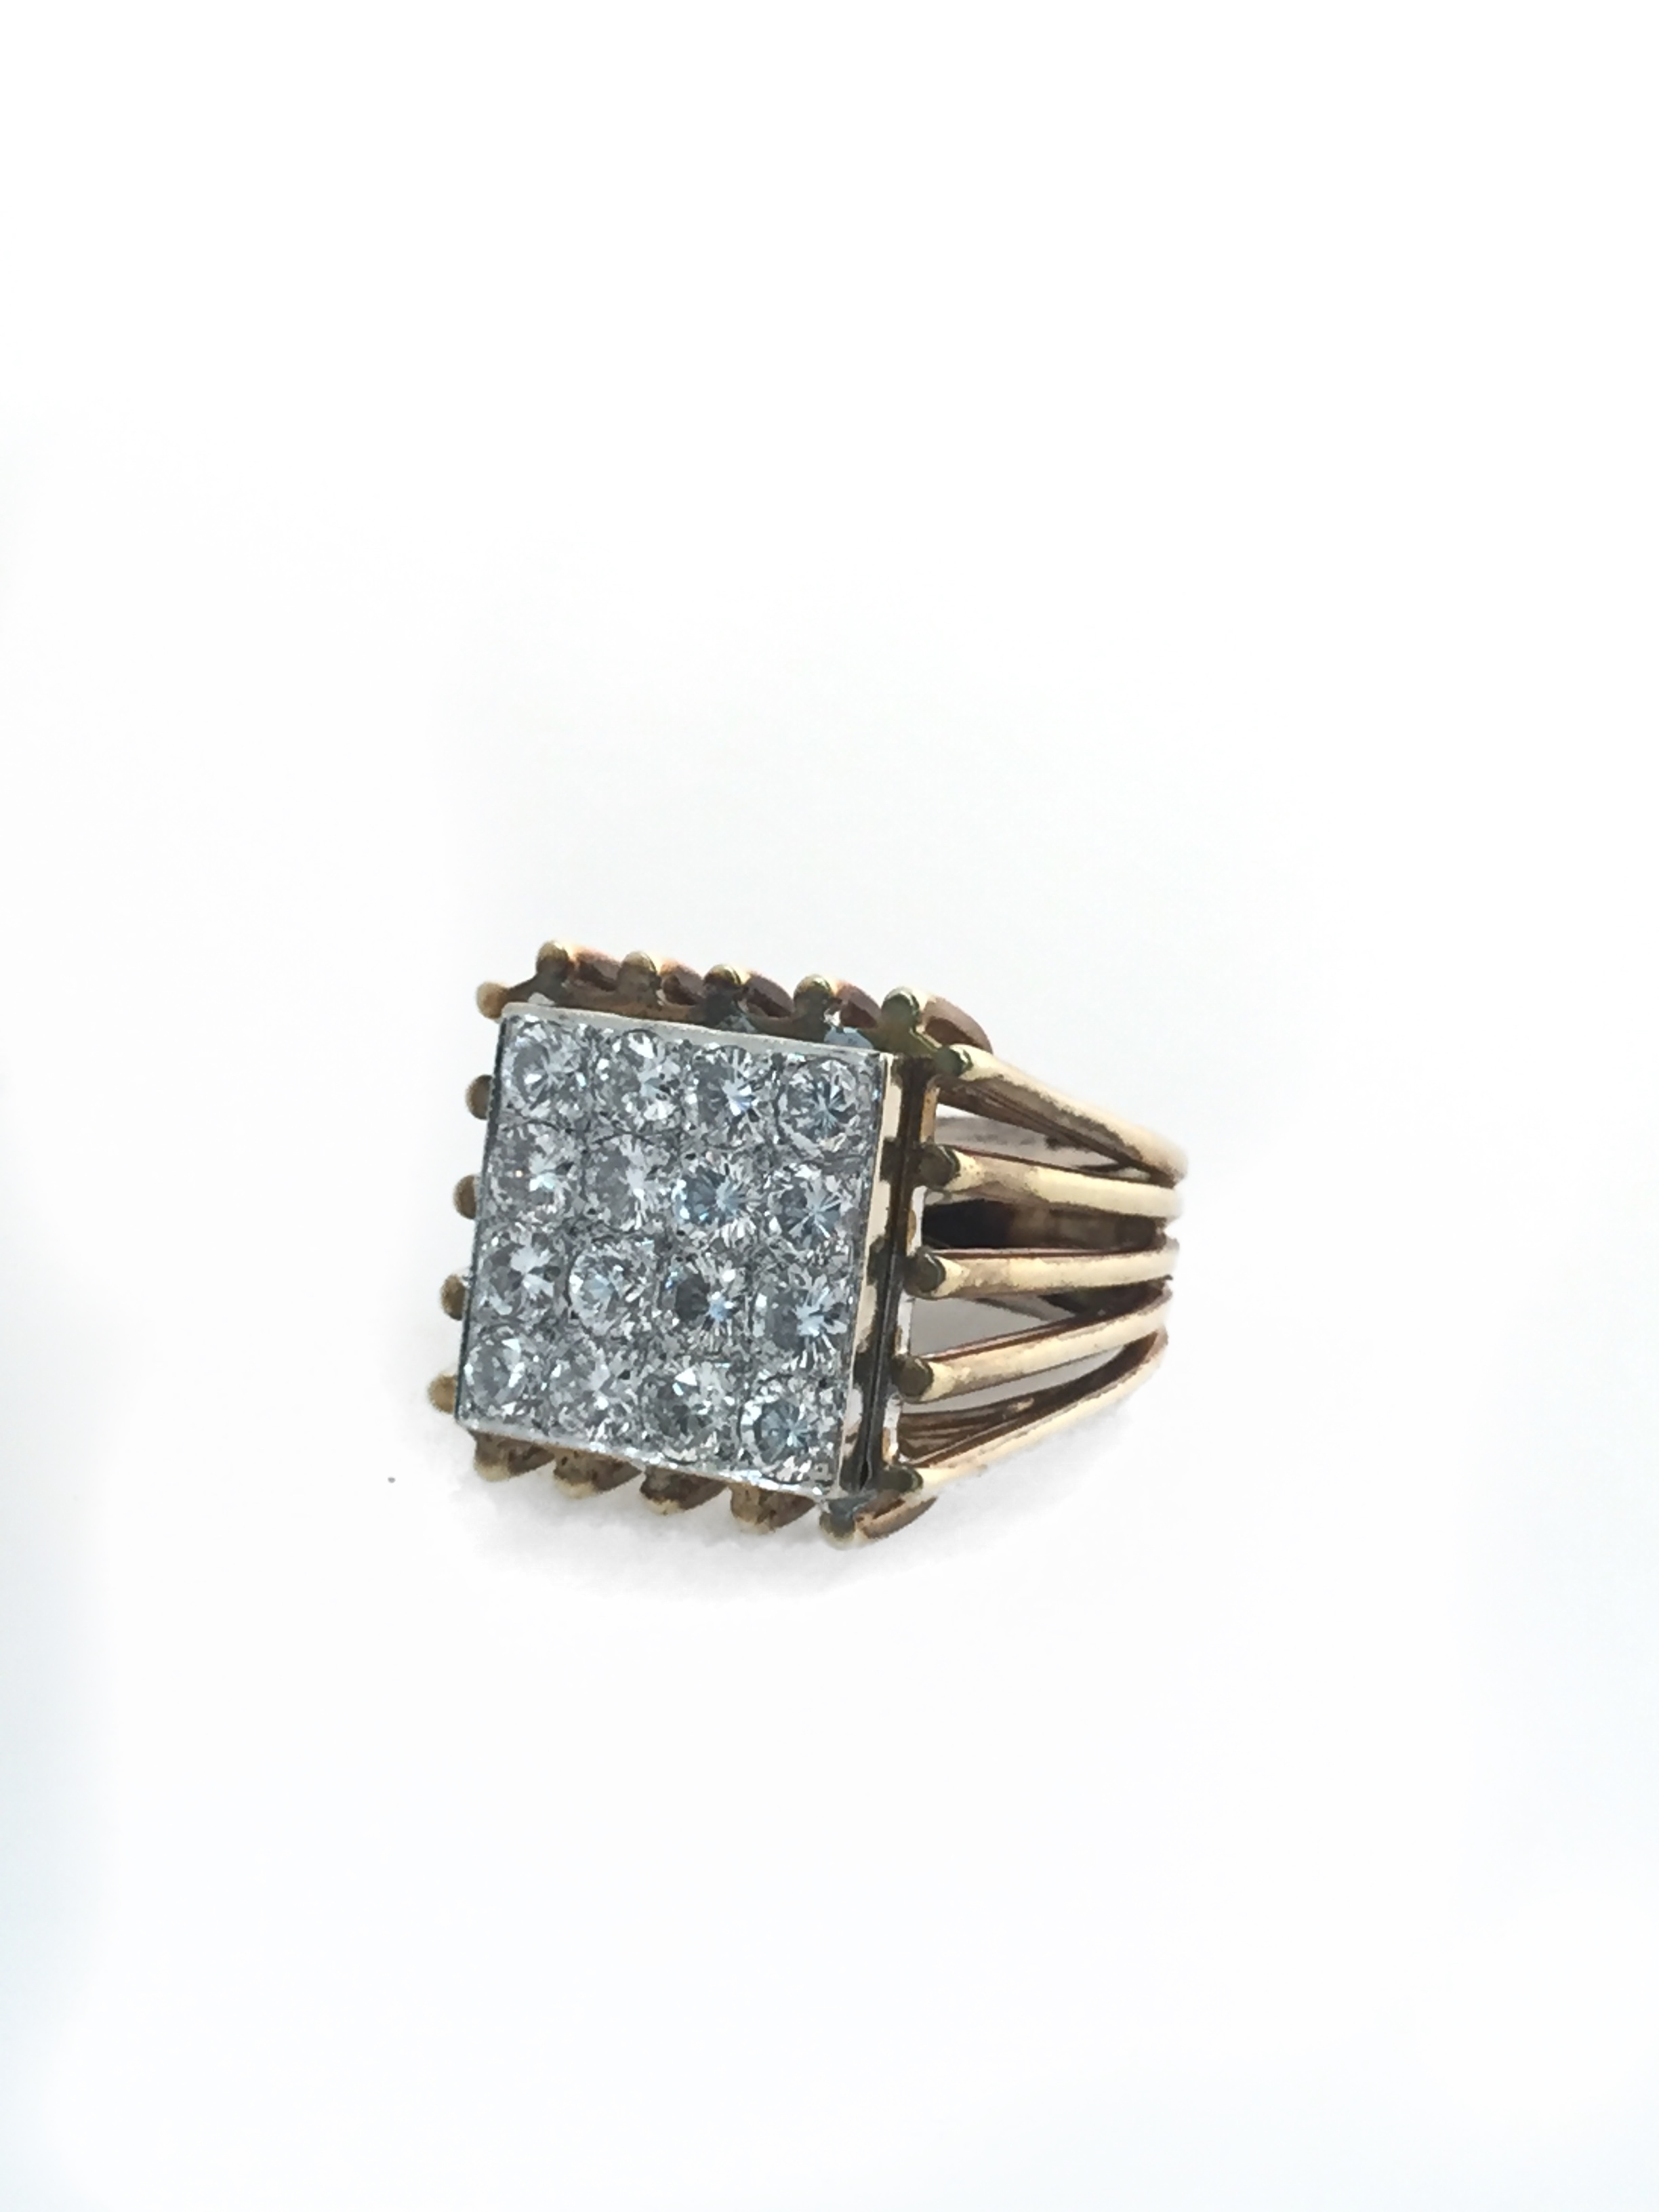 Men's 18K Yellow Gold Diamond Fancy Ring.